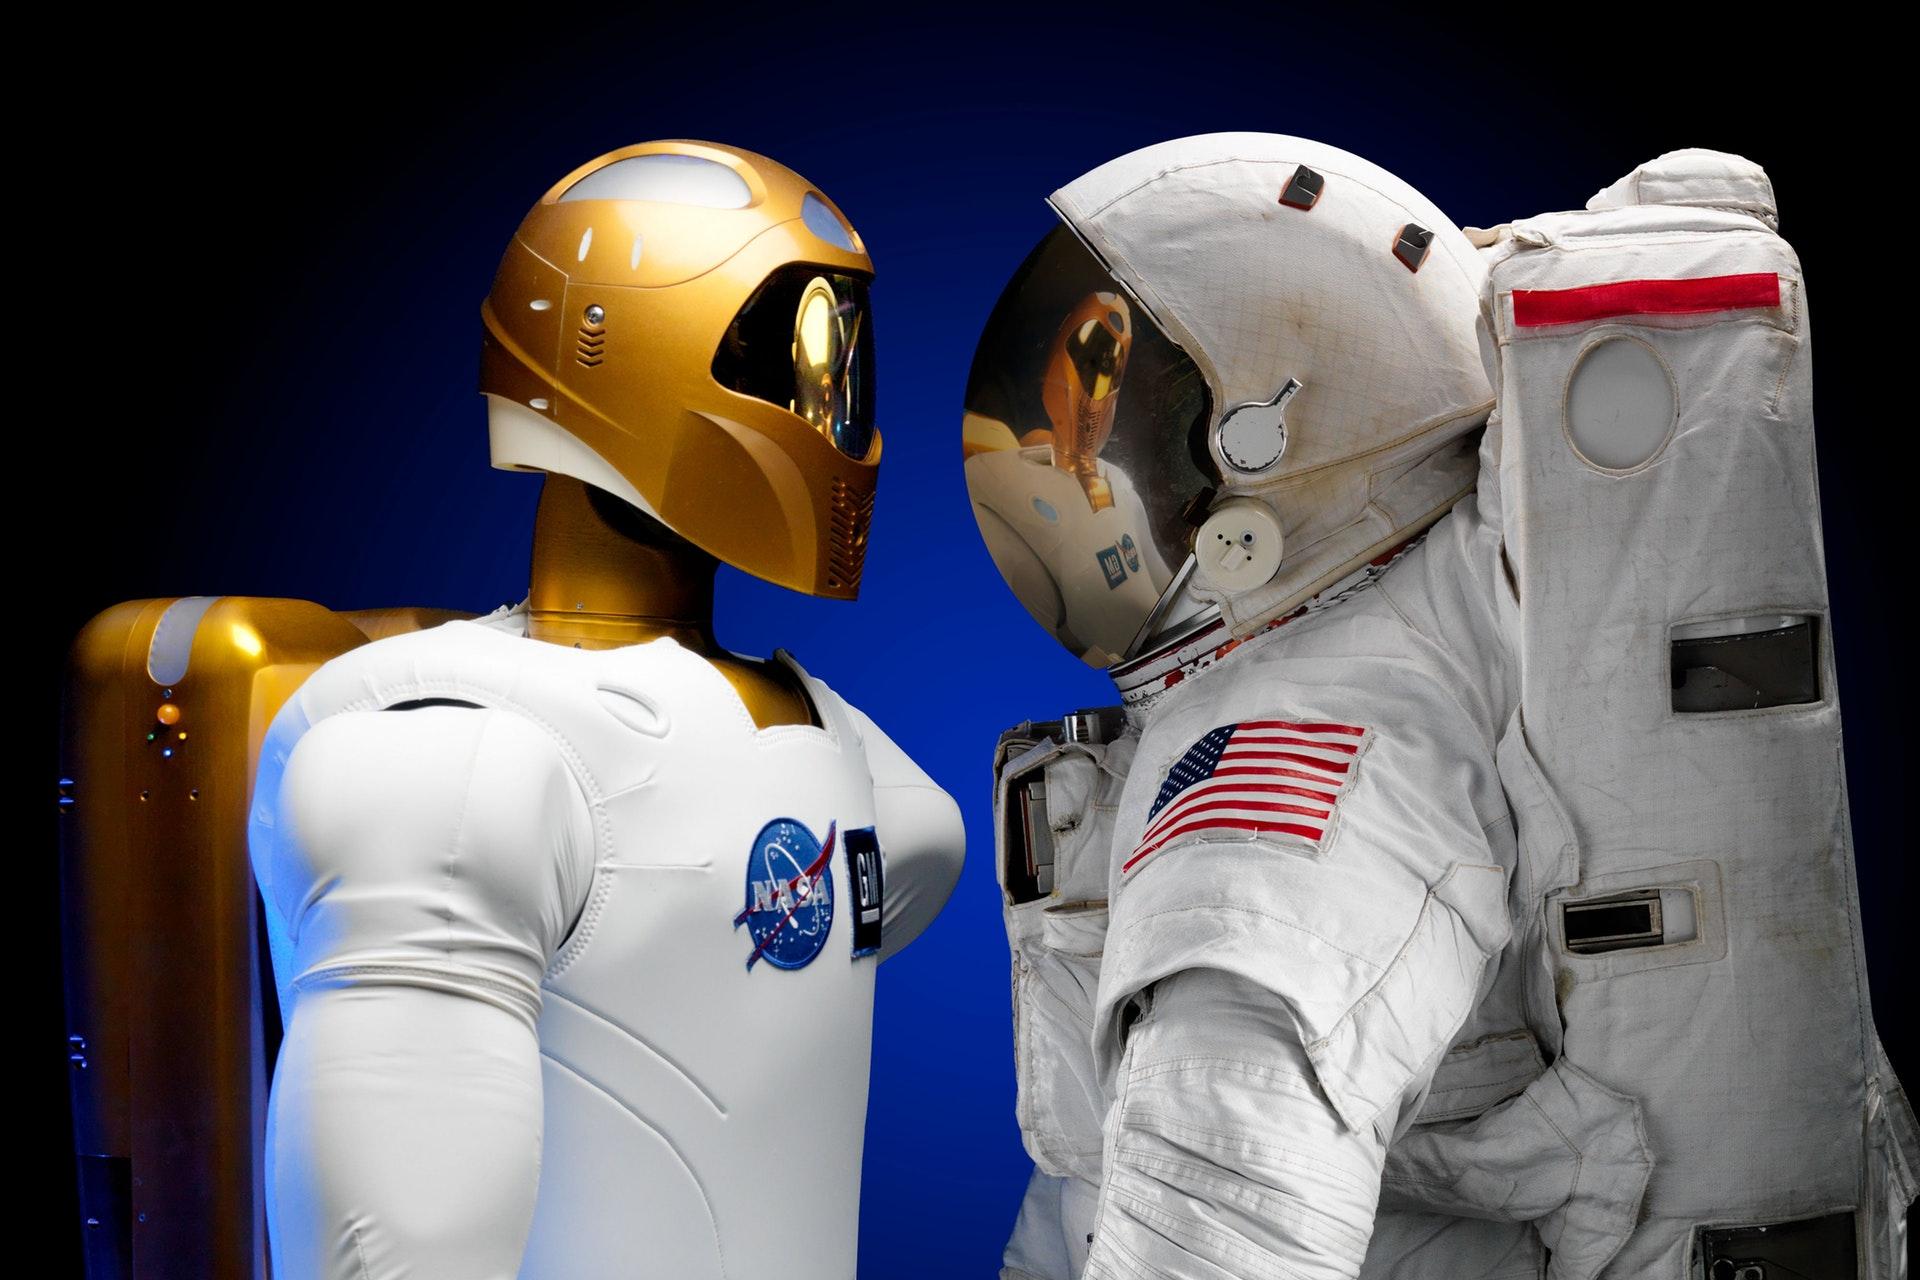 Astronauts, Avatars, and Loneliness